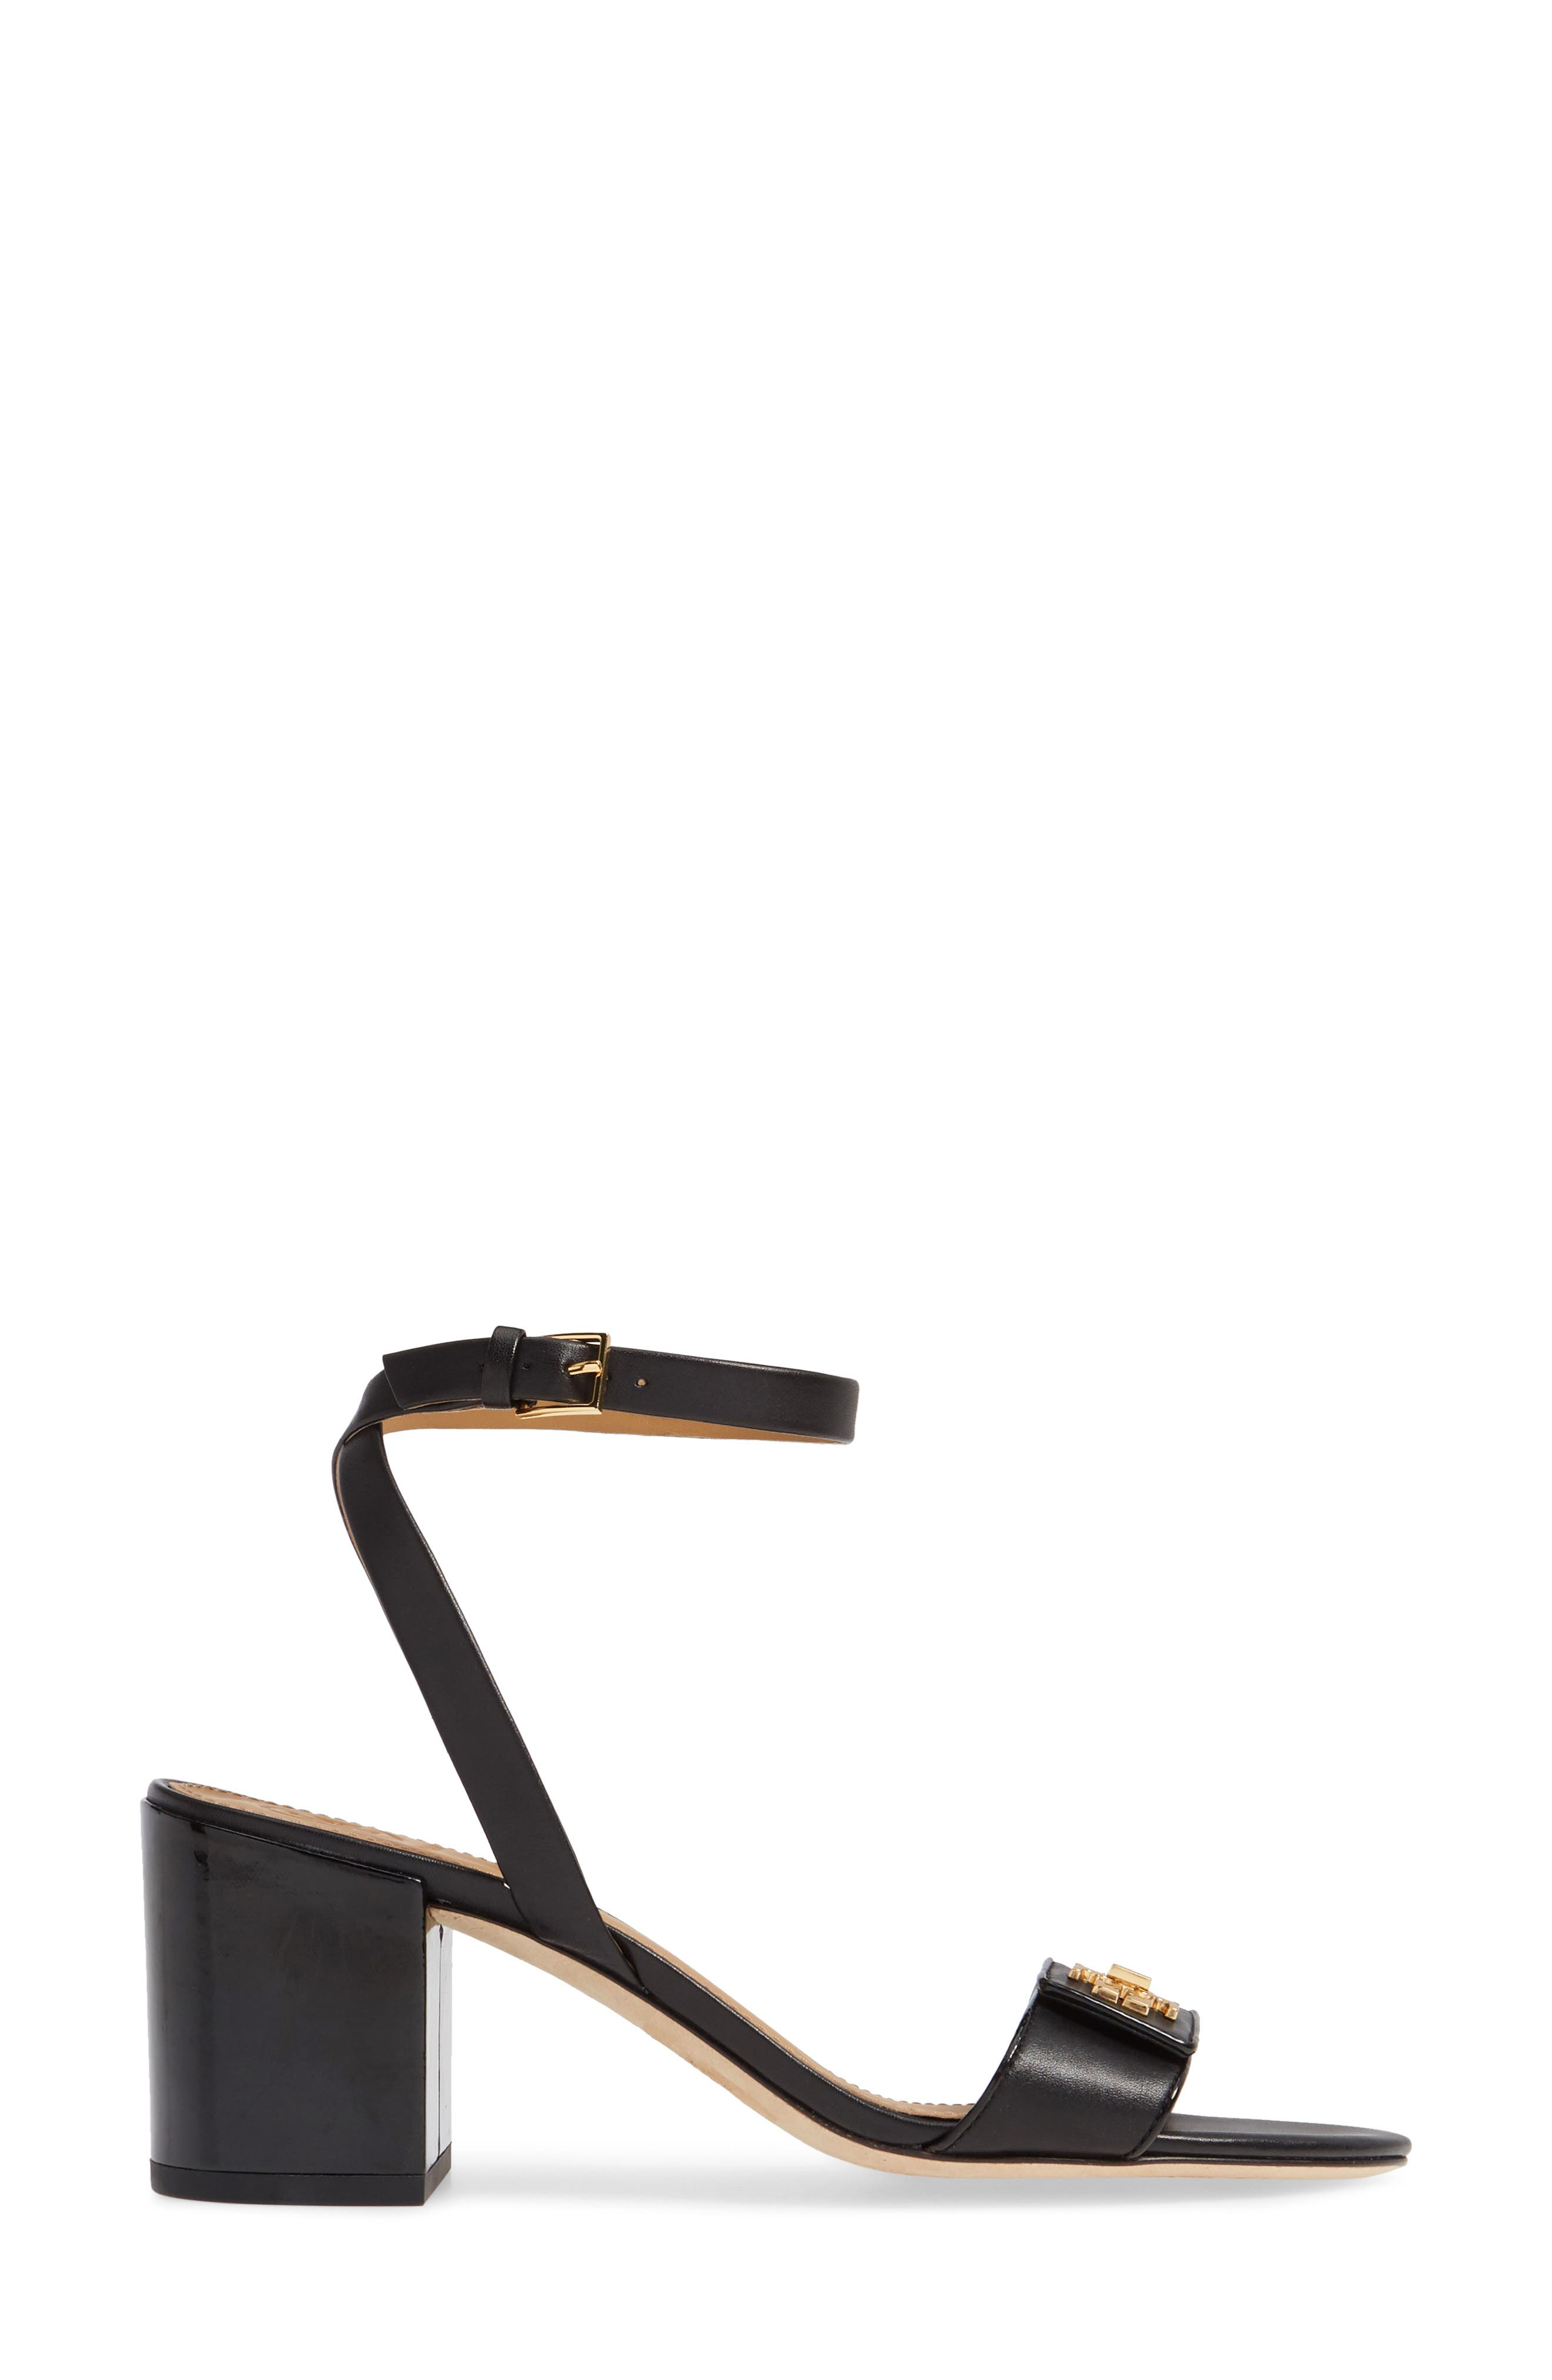 Kira Block Heel Sandal,                             Alternate thumbnail 3, color,                             PERFECT BLACK/ PERFECT BLACK